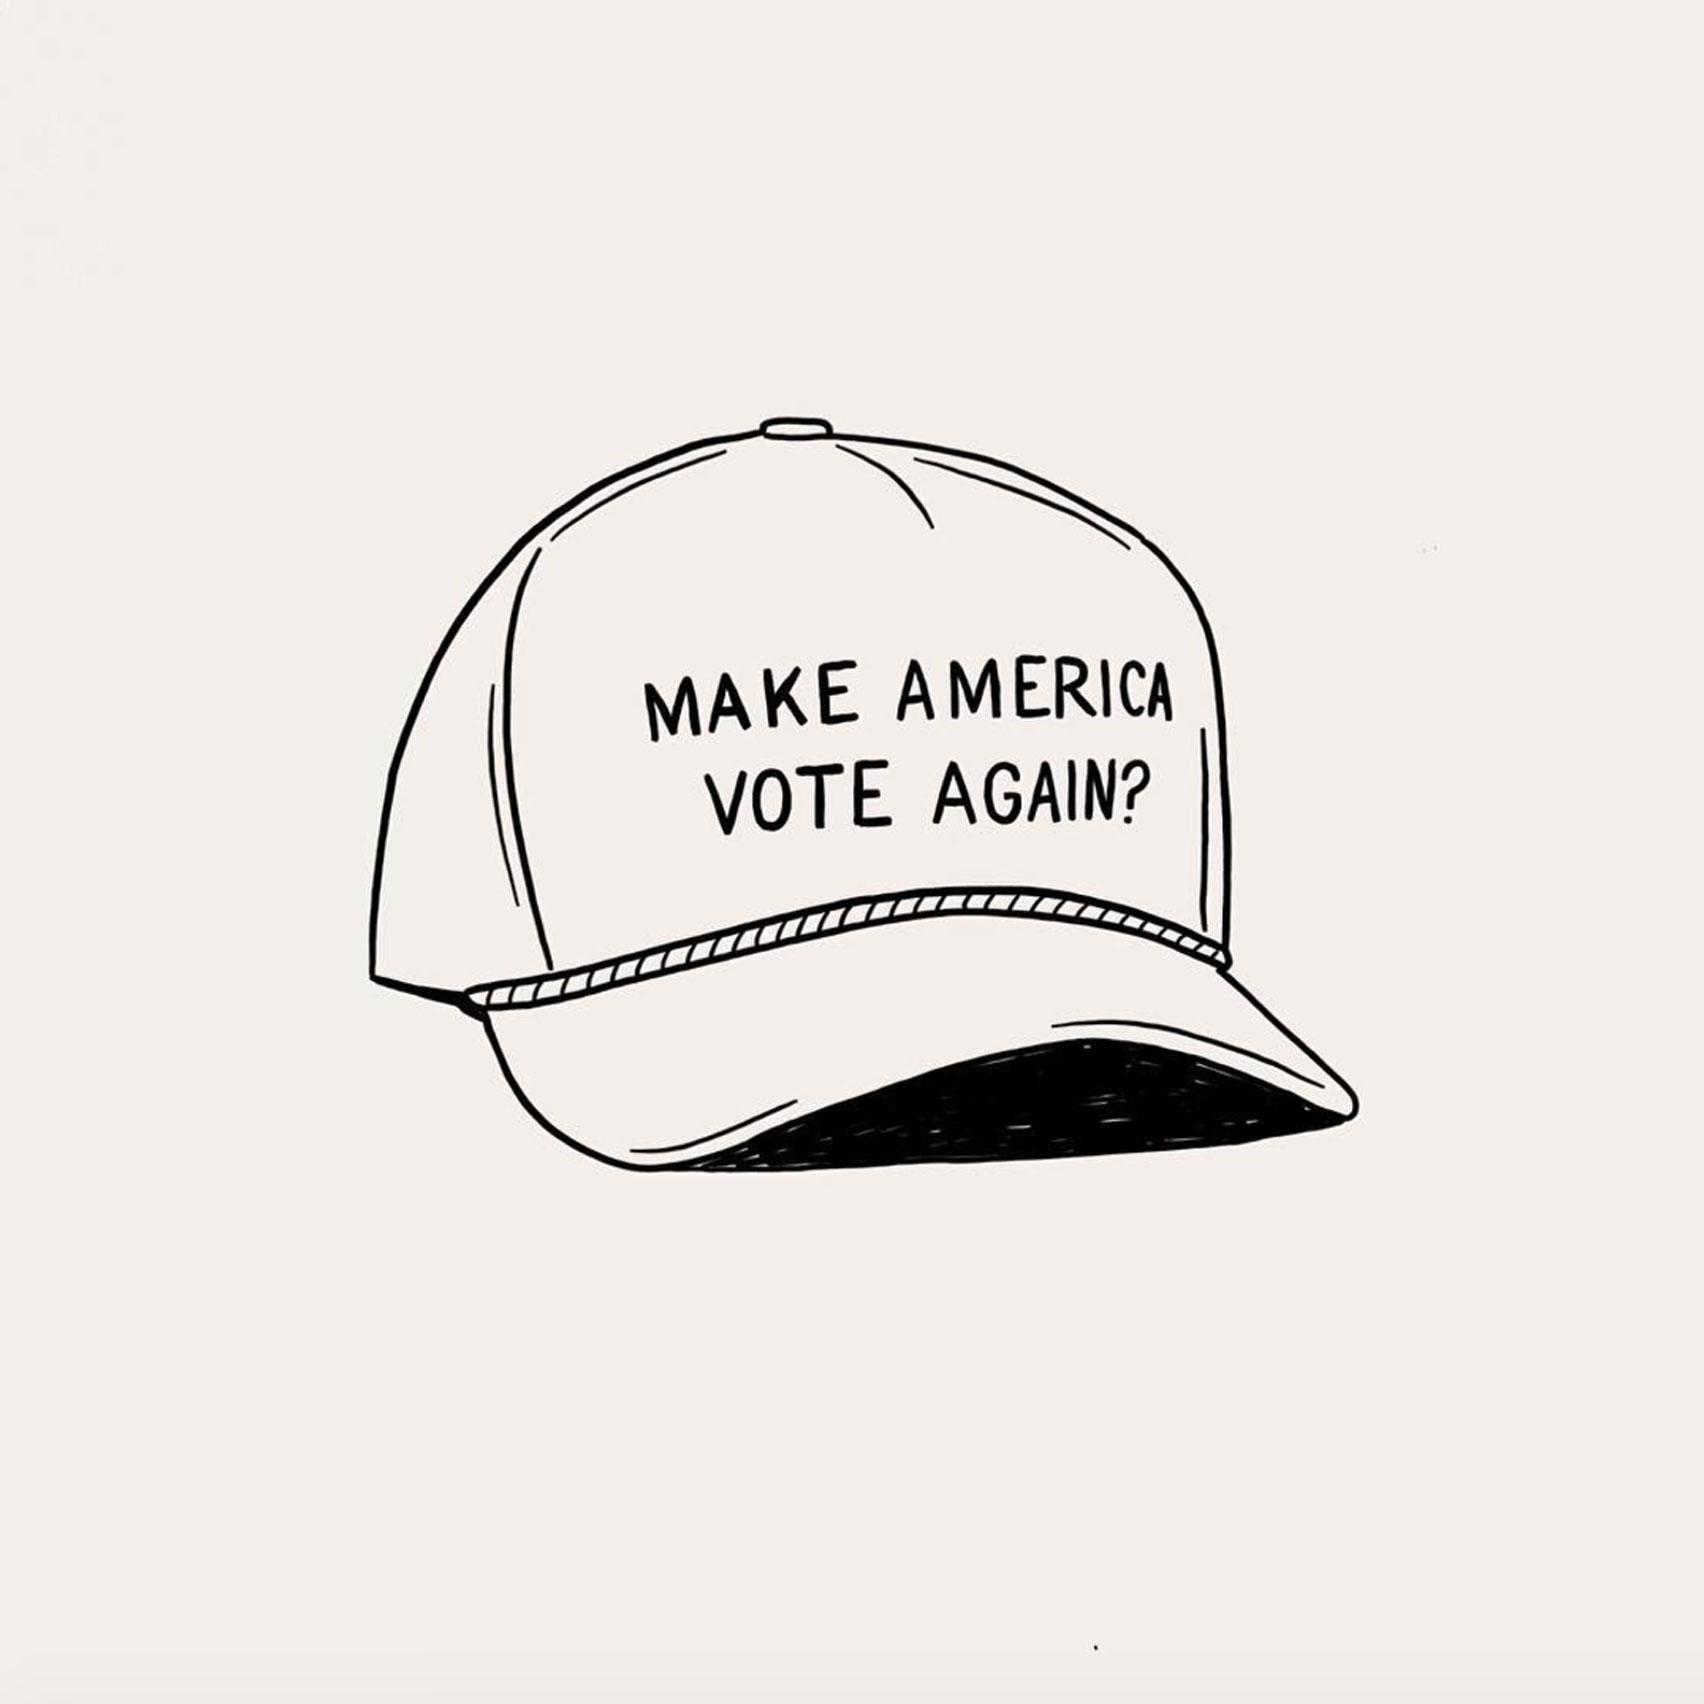 Make America Vote Again? illustration